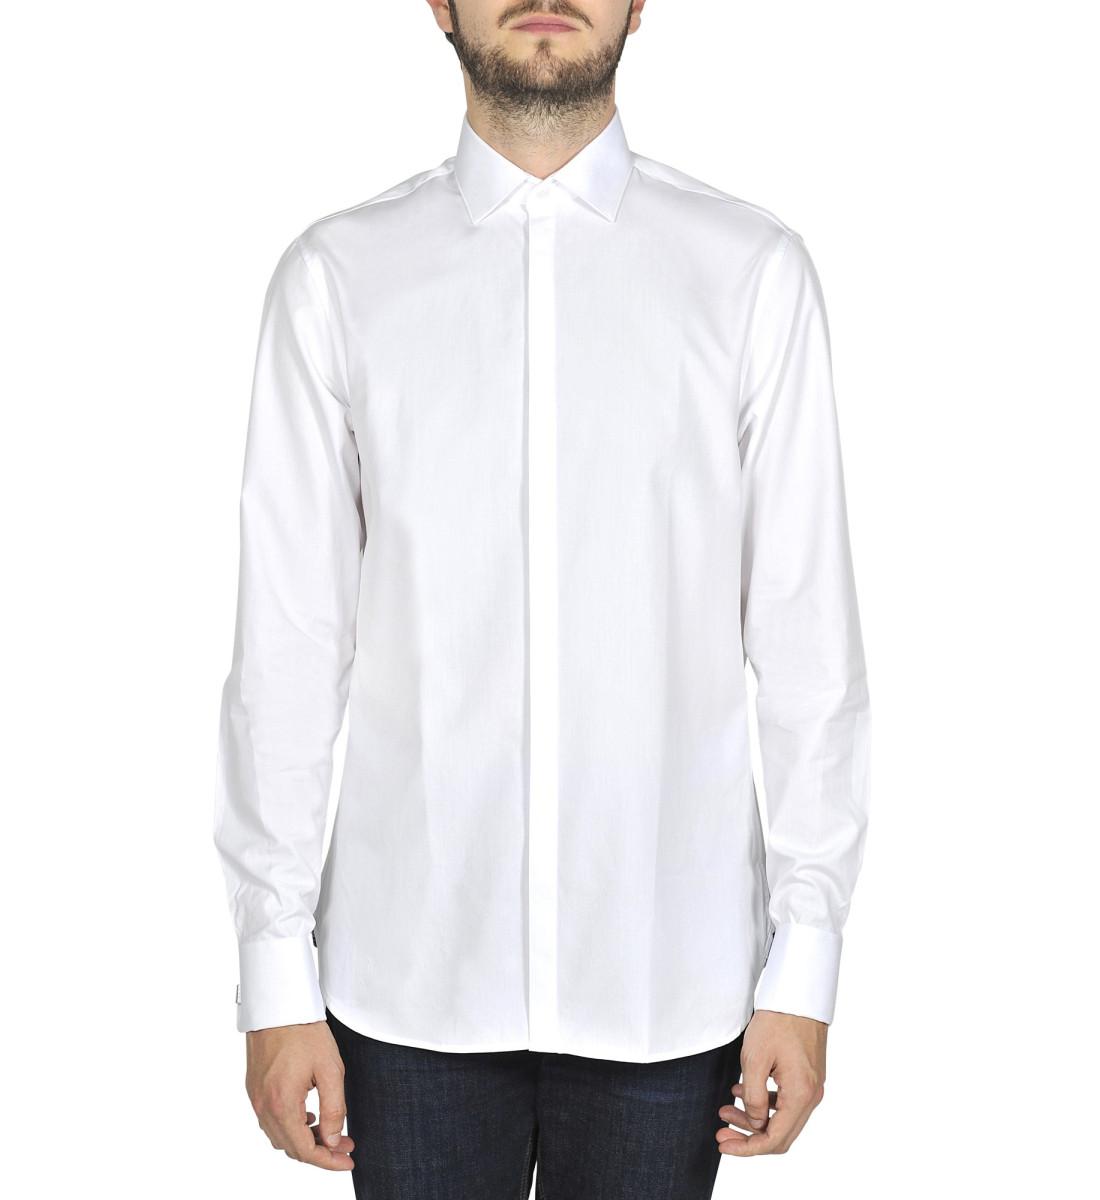 Chemise ajustée cérémonie col italien BLANC